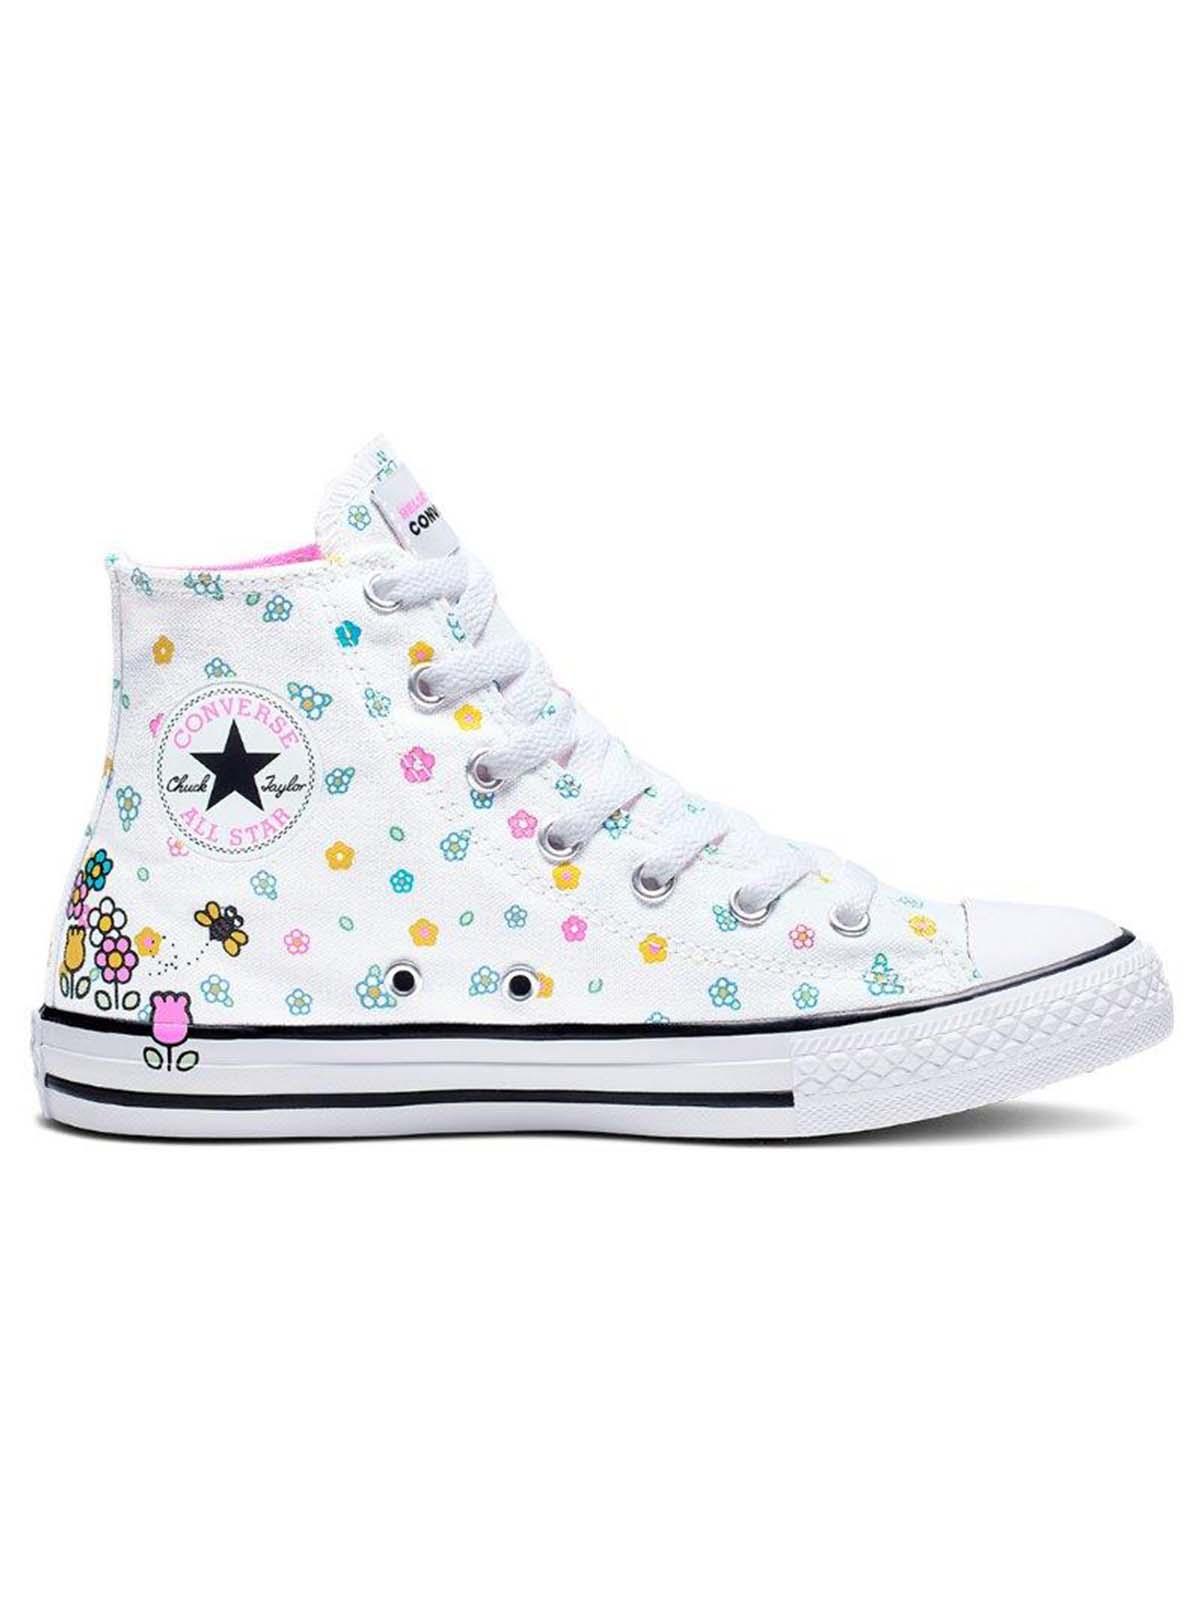 Converse ילדים // Hello Kitty  גבוה